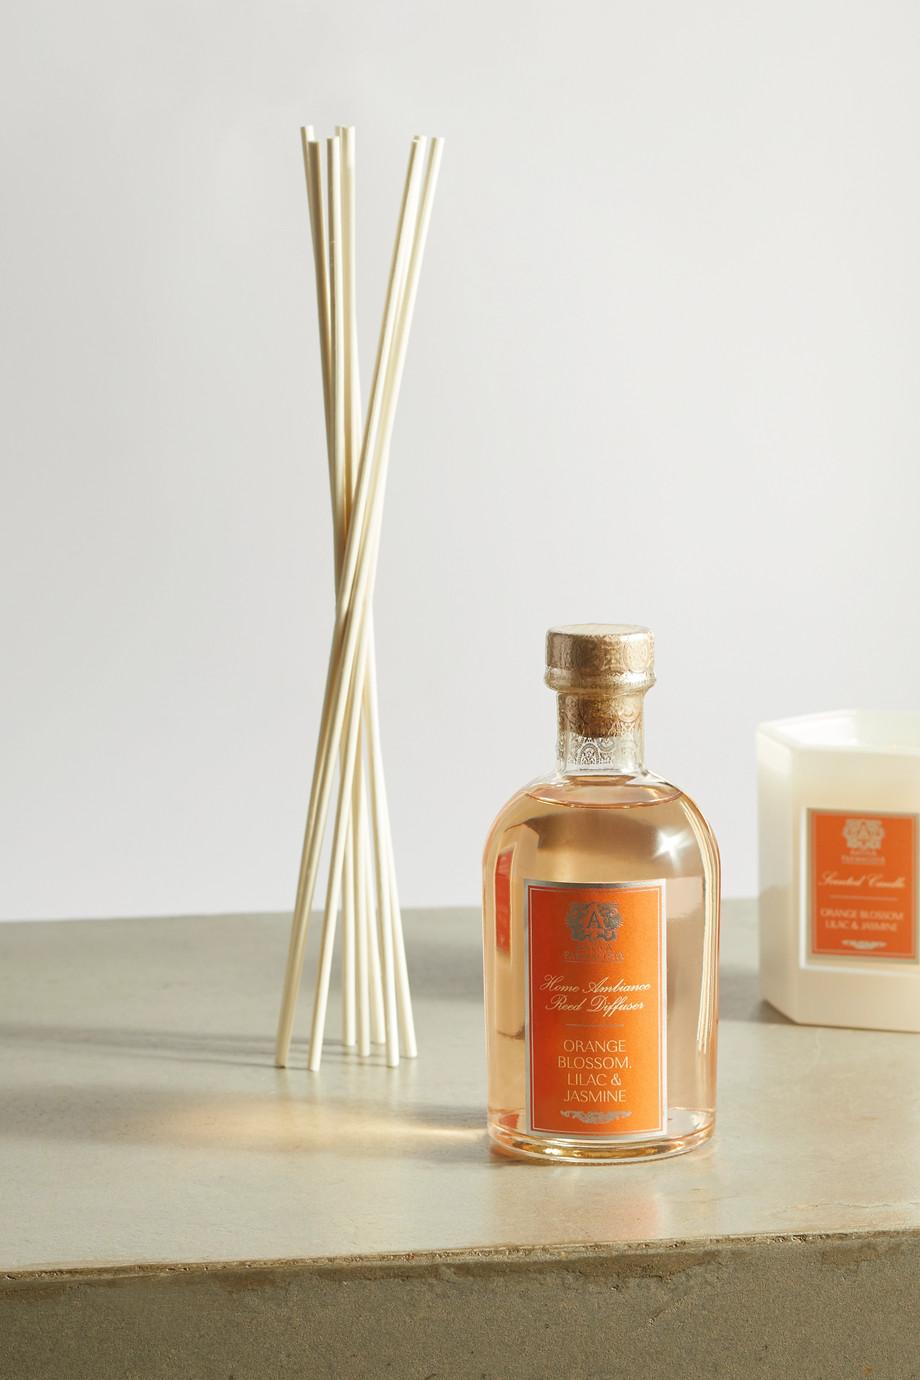 Antica Farmacista Orange Blossom, Lilac & Jasmine, 250 ml – Raumduft